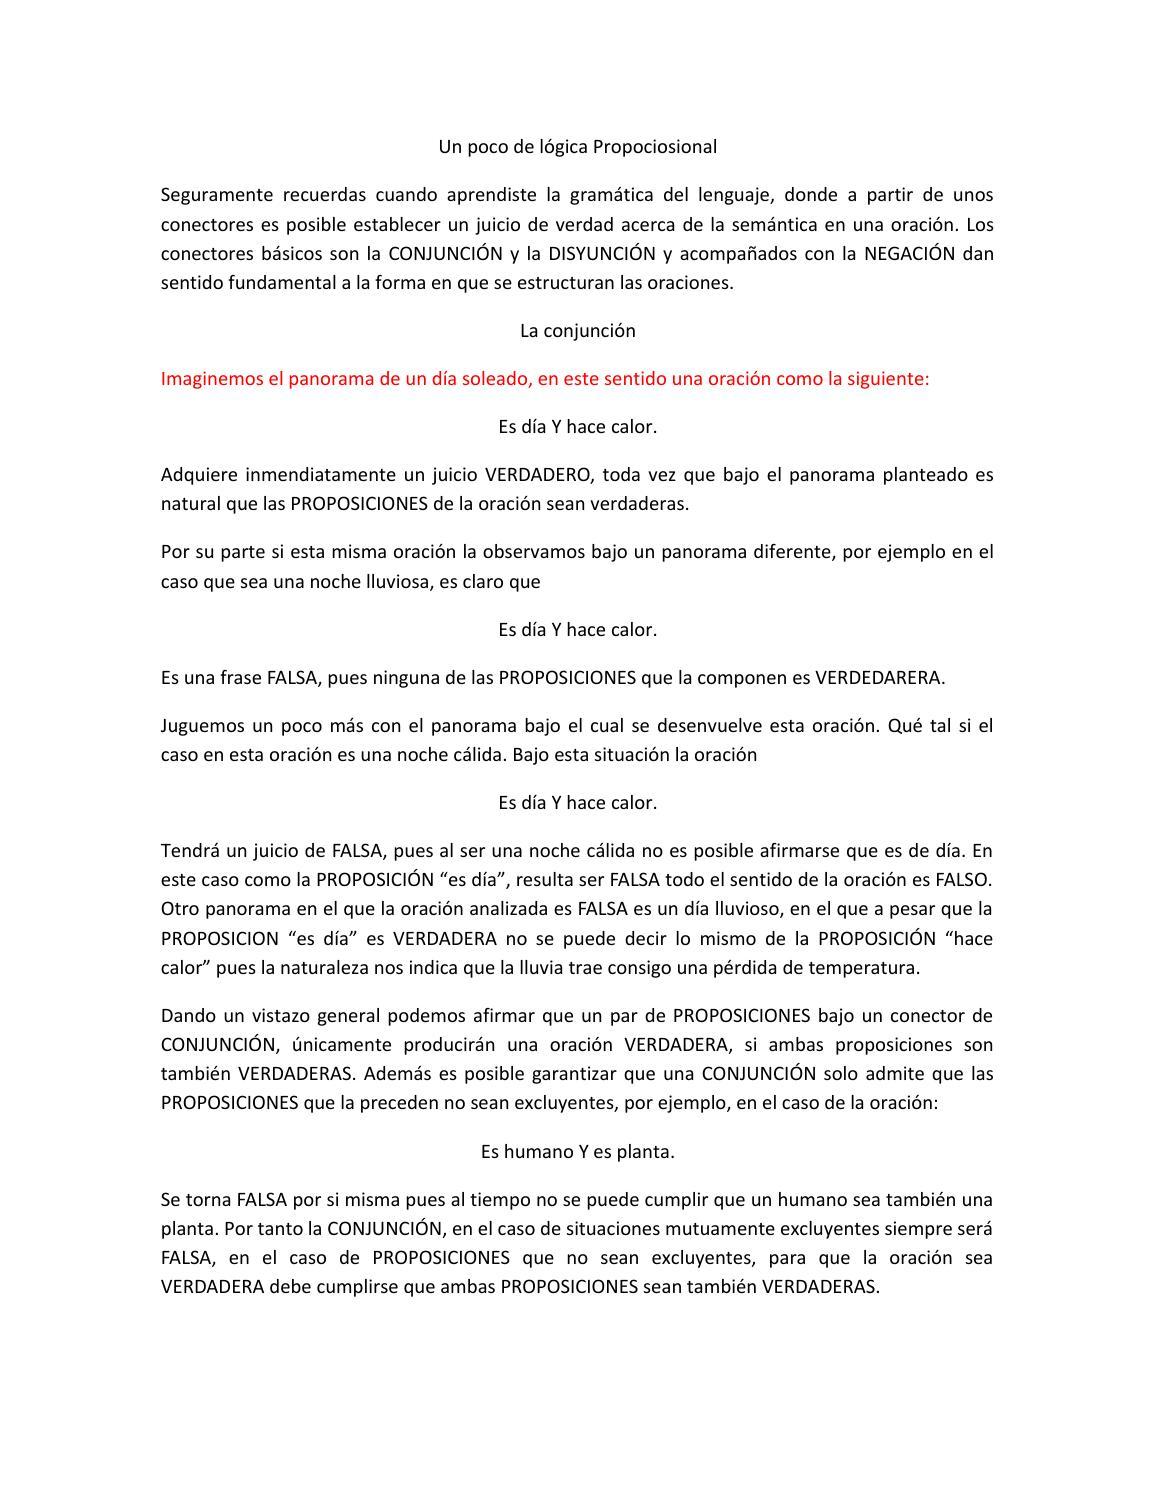 Un Poco De Lógica Propociosional By Santiago Murillo Rendon